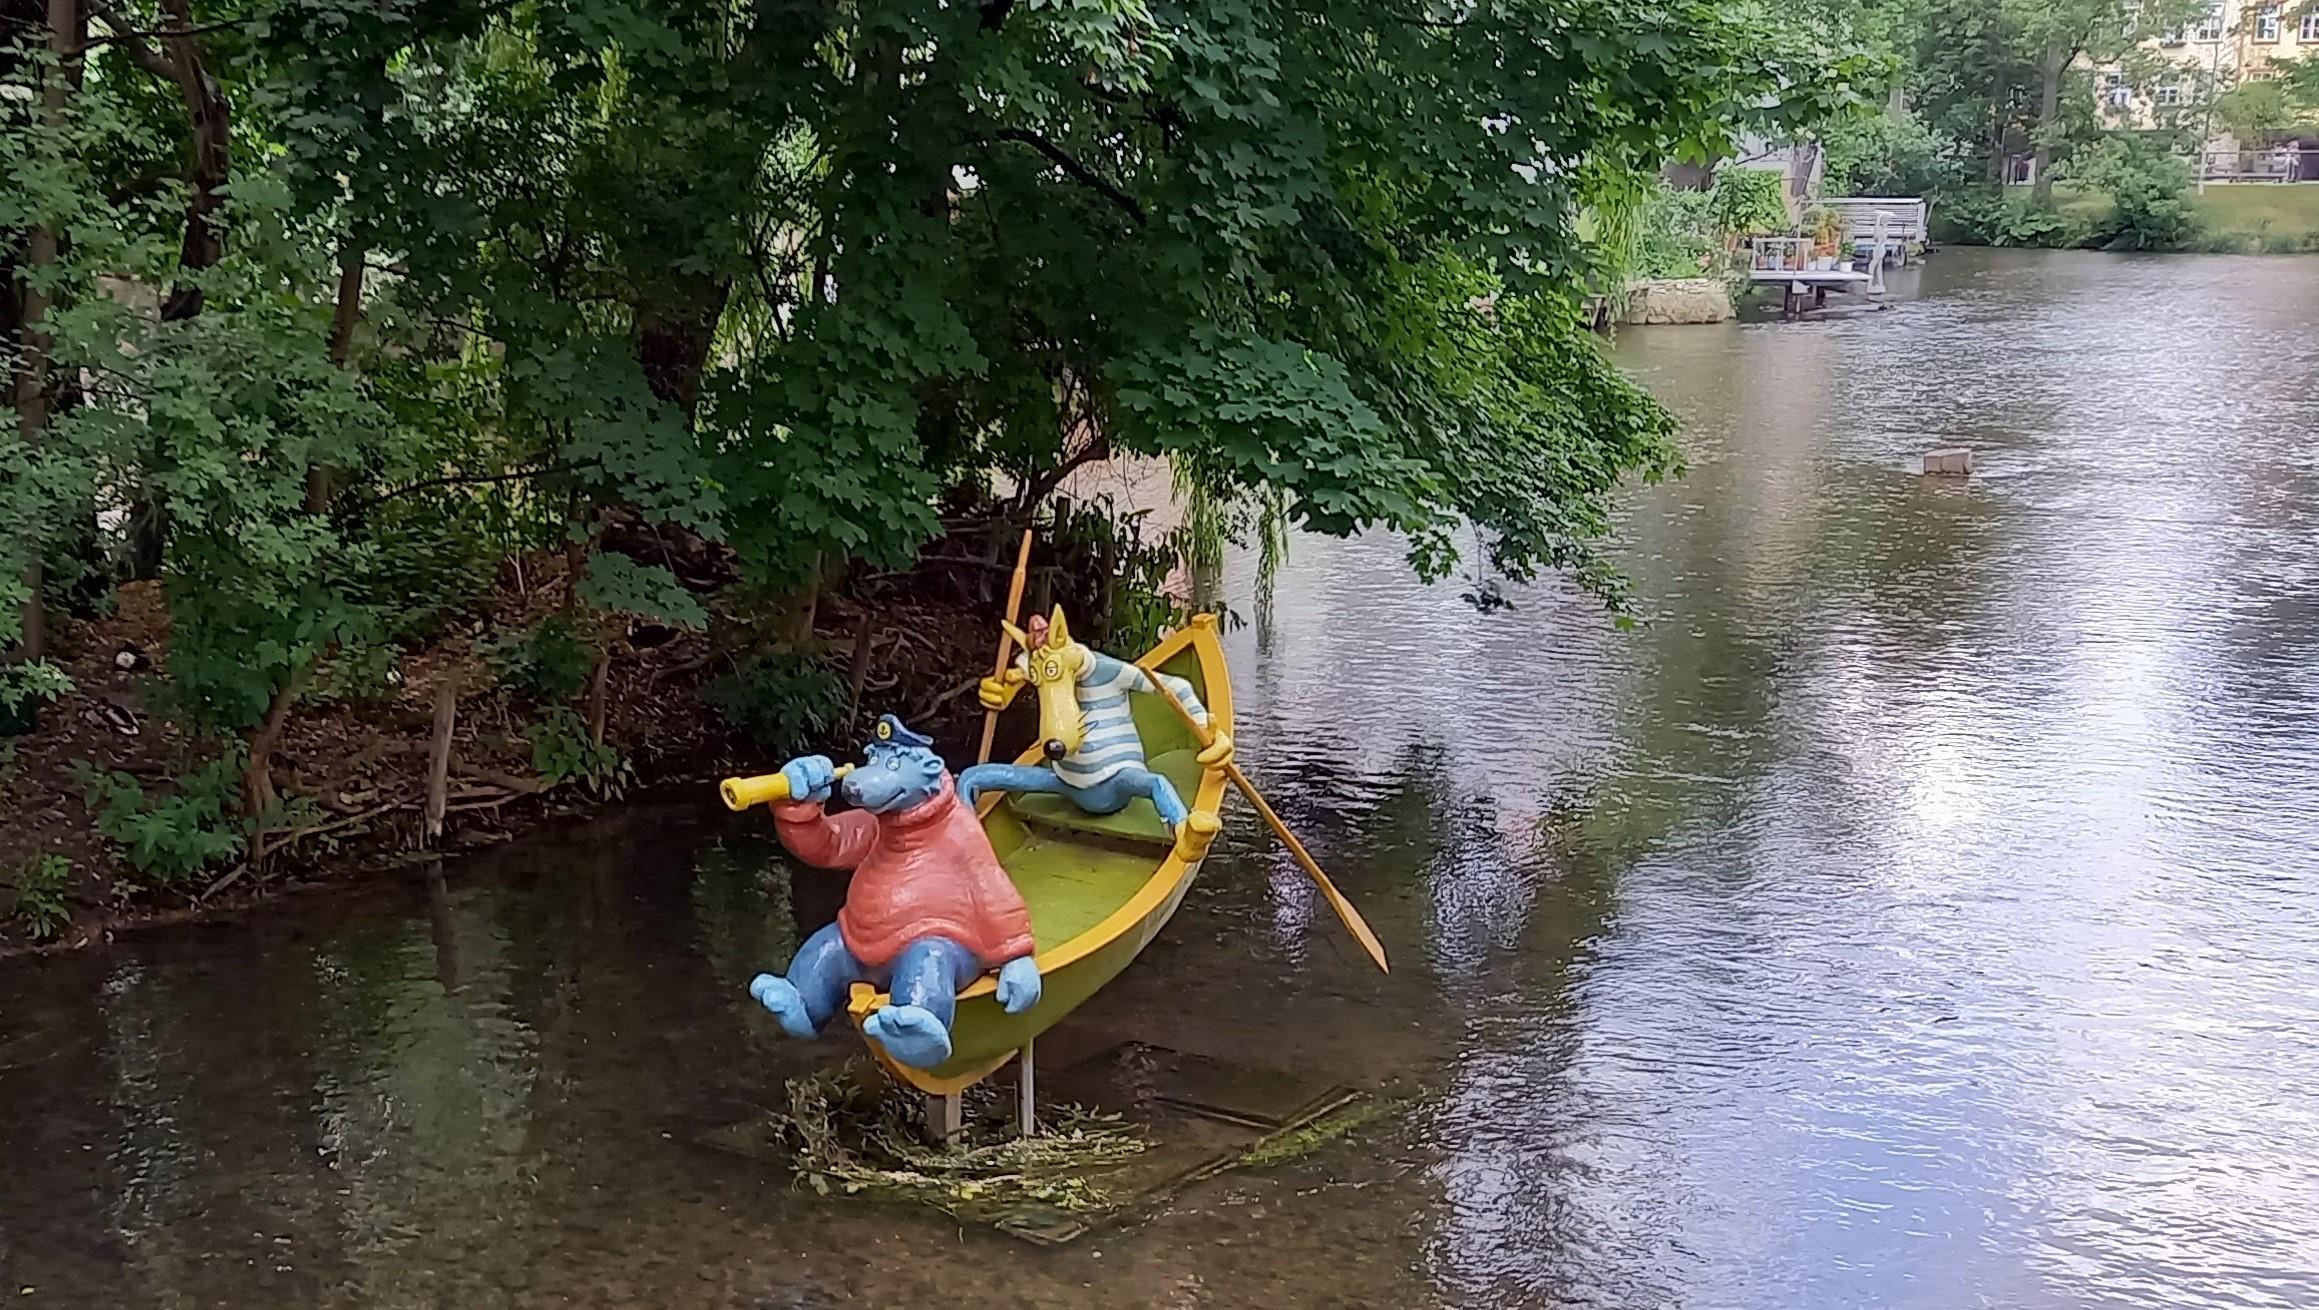 Käpt'n Blaubär und Hein Blöd nahe der Schlösserbrücke in Erfurt